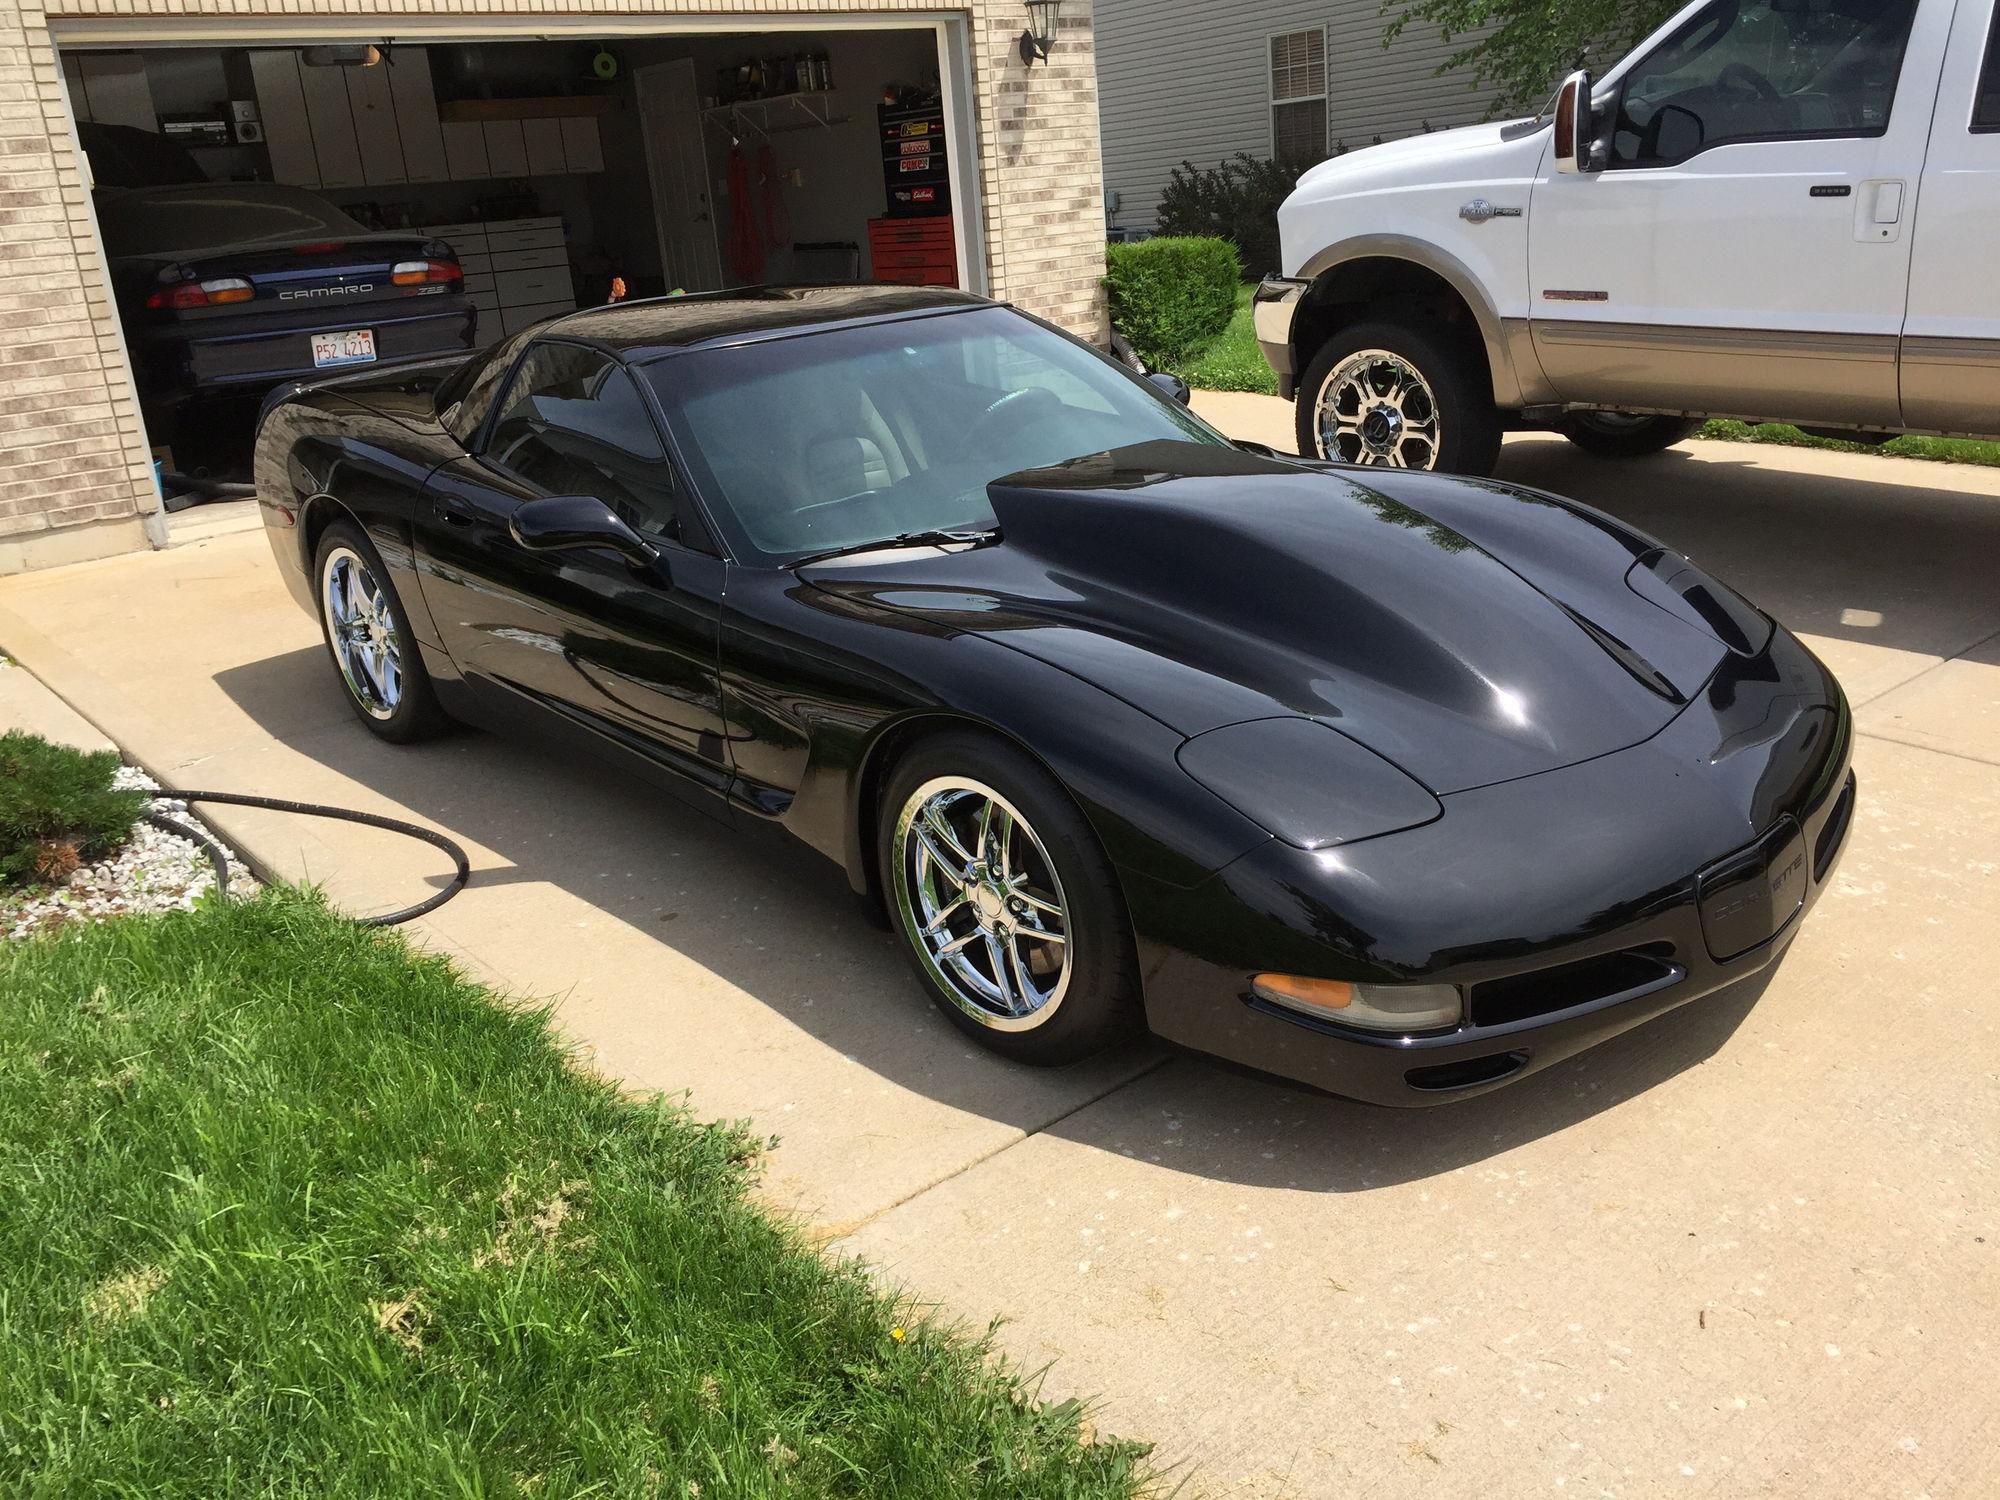 99 Built Targa Top Coupe Corvetteforum Chevrolet